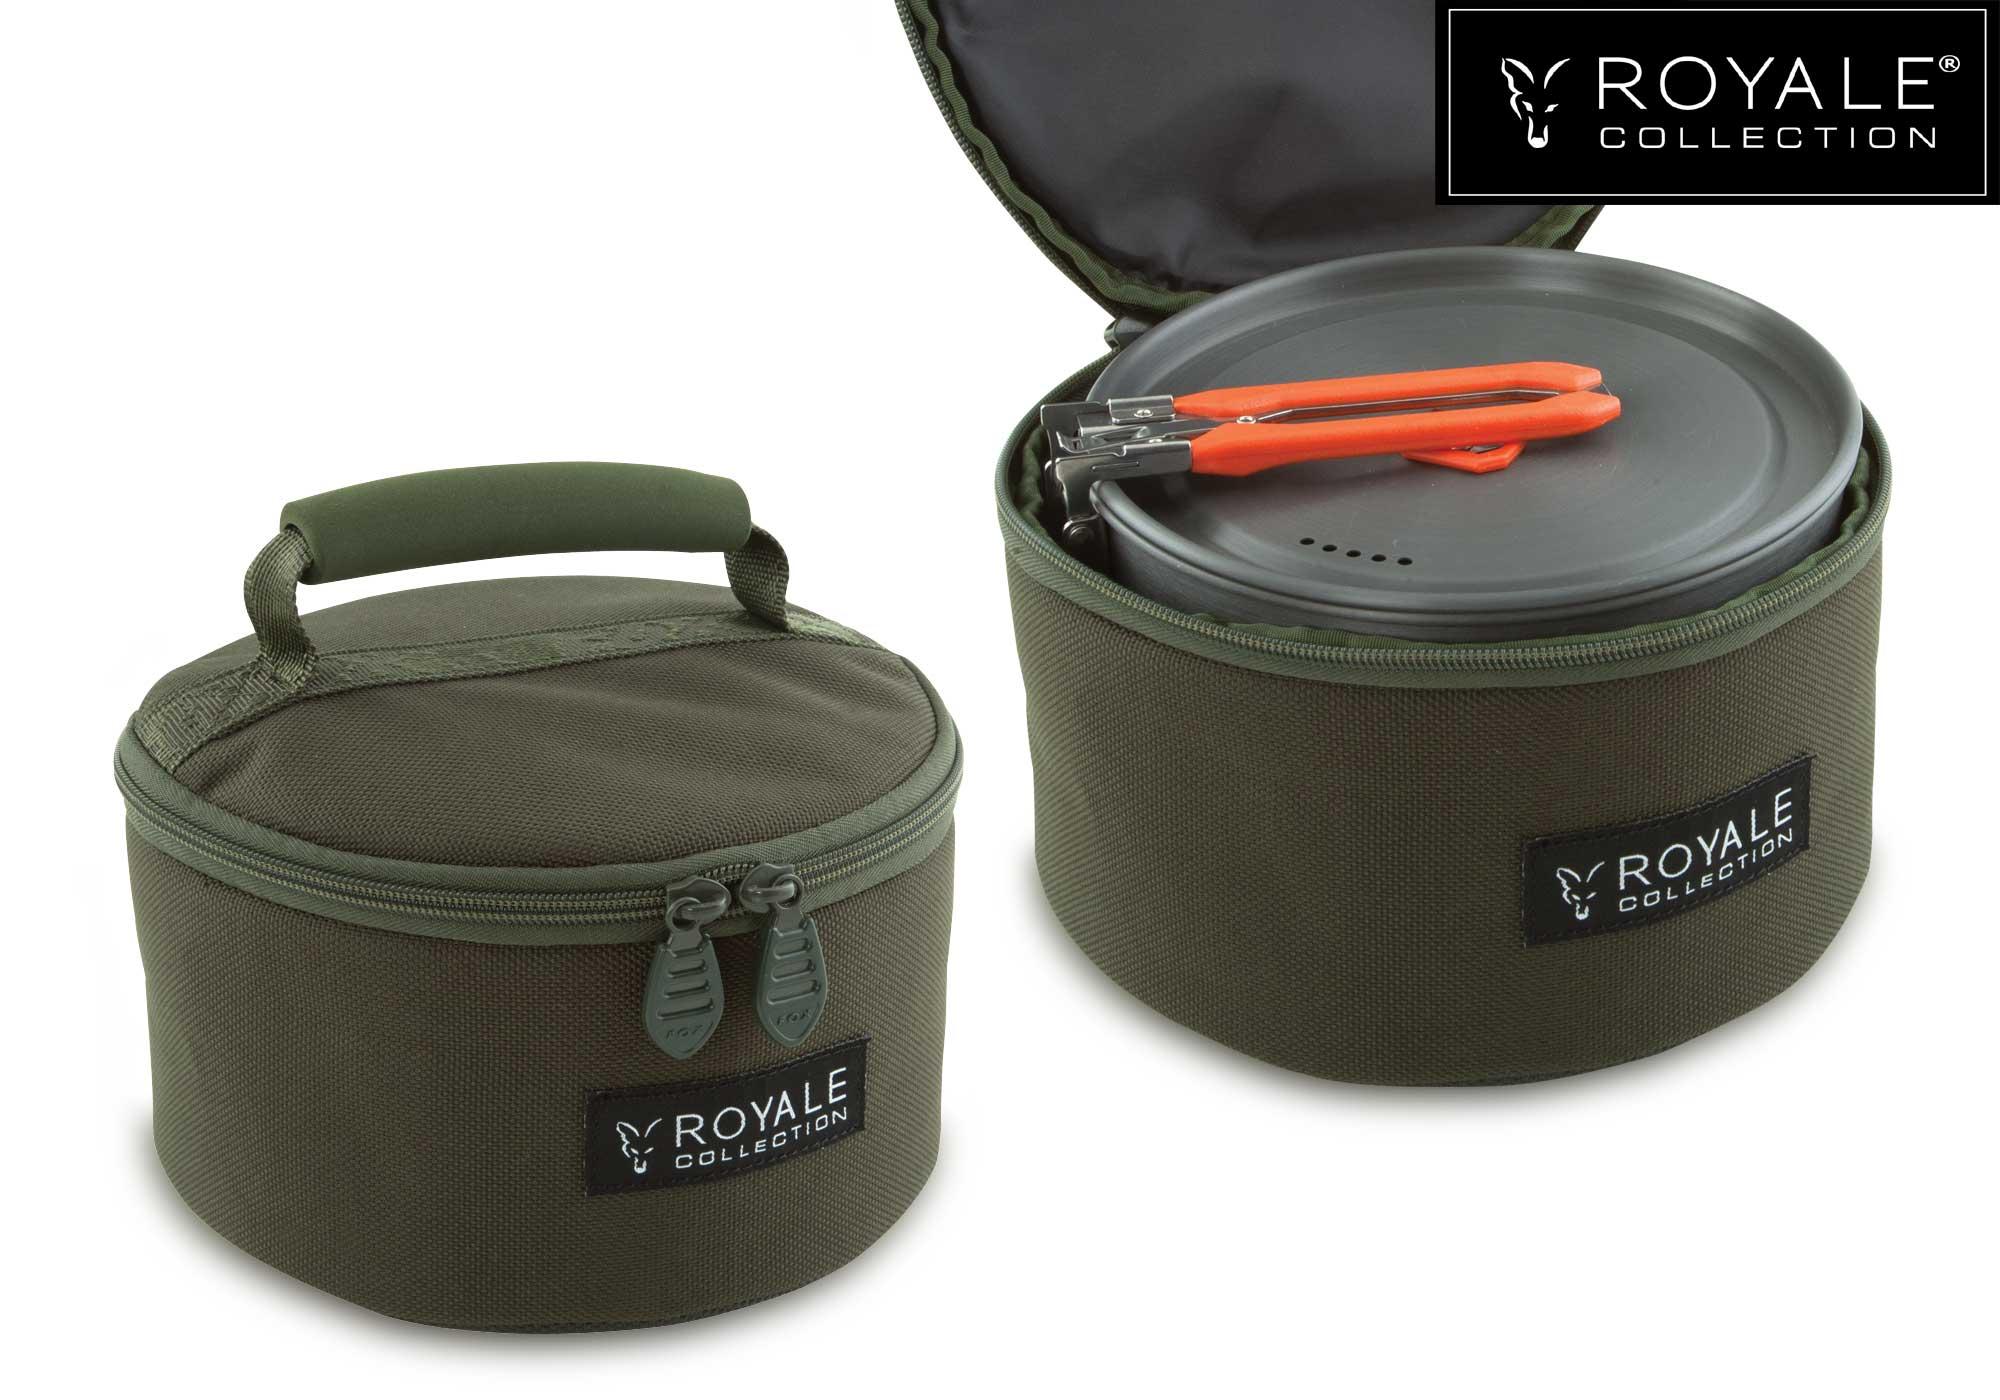 FOX Сумка для посуды ROYALE® COOKSET BAGS  3pc Cookset